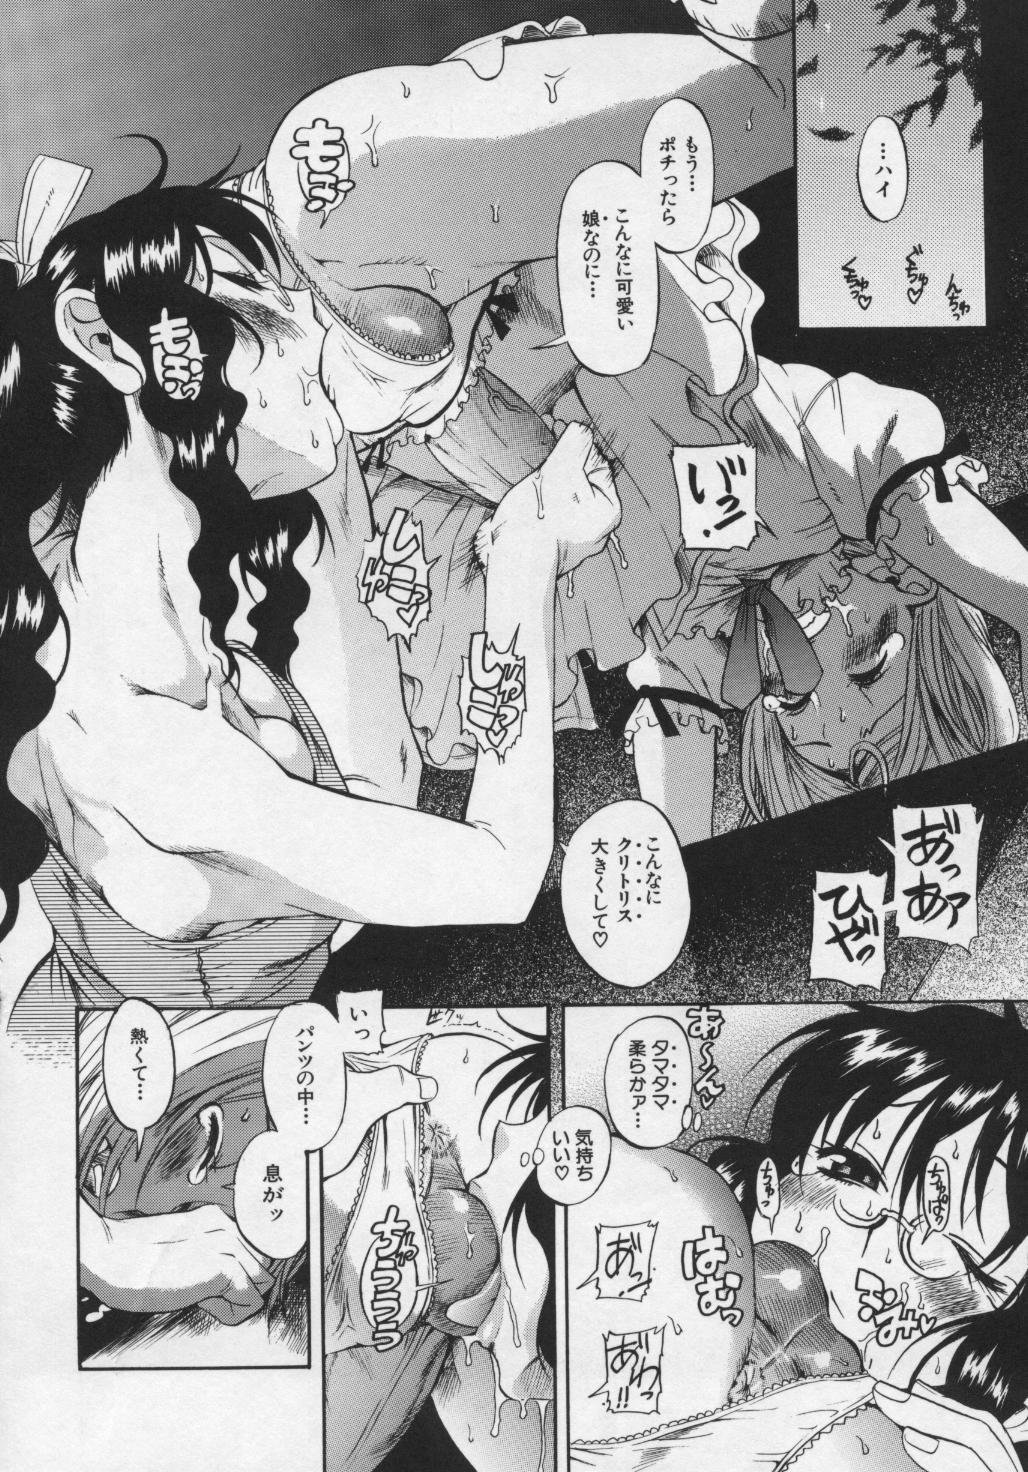 Kimi no Na o Yobeba - If I call your name. 130